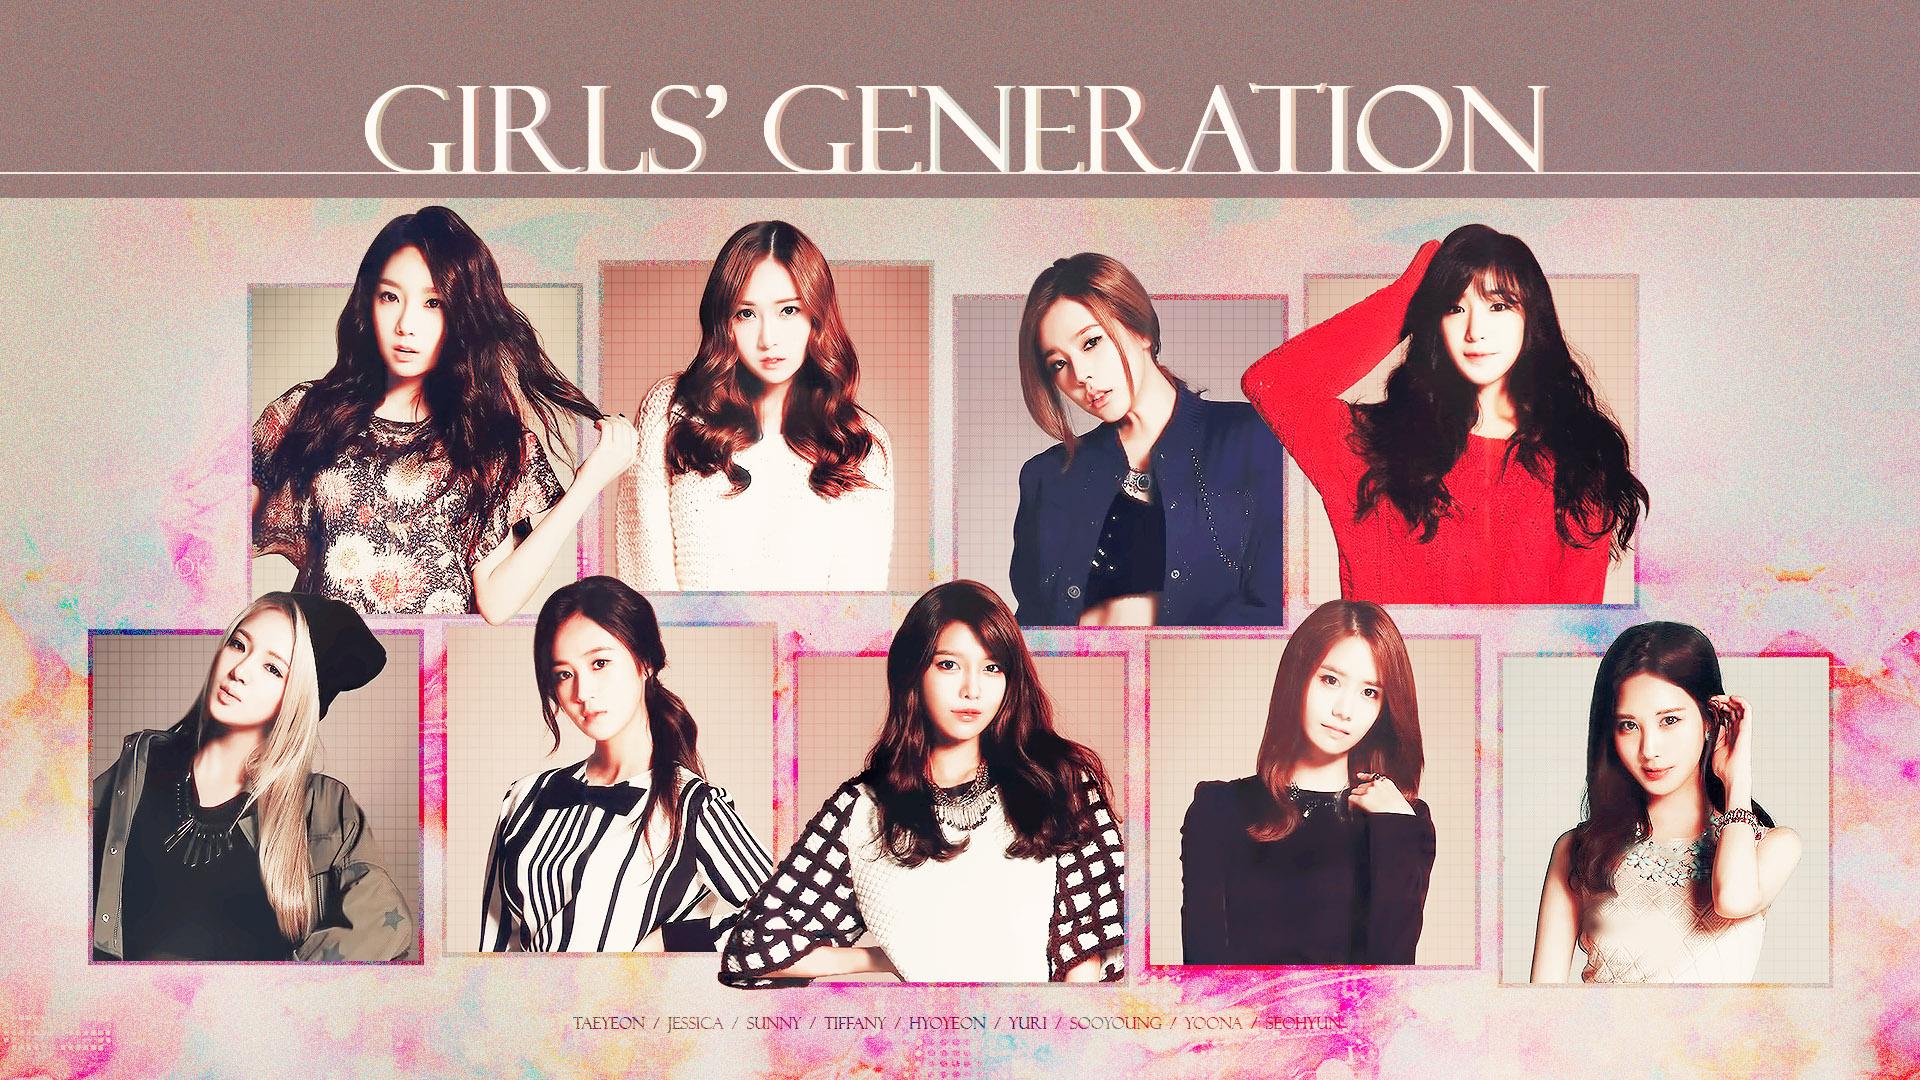 Snsd Wallpaper Girls Generation Members 2018 290401